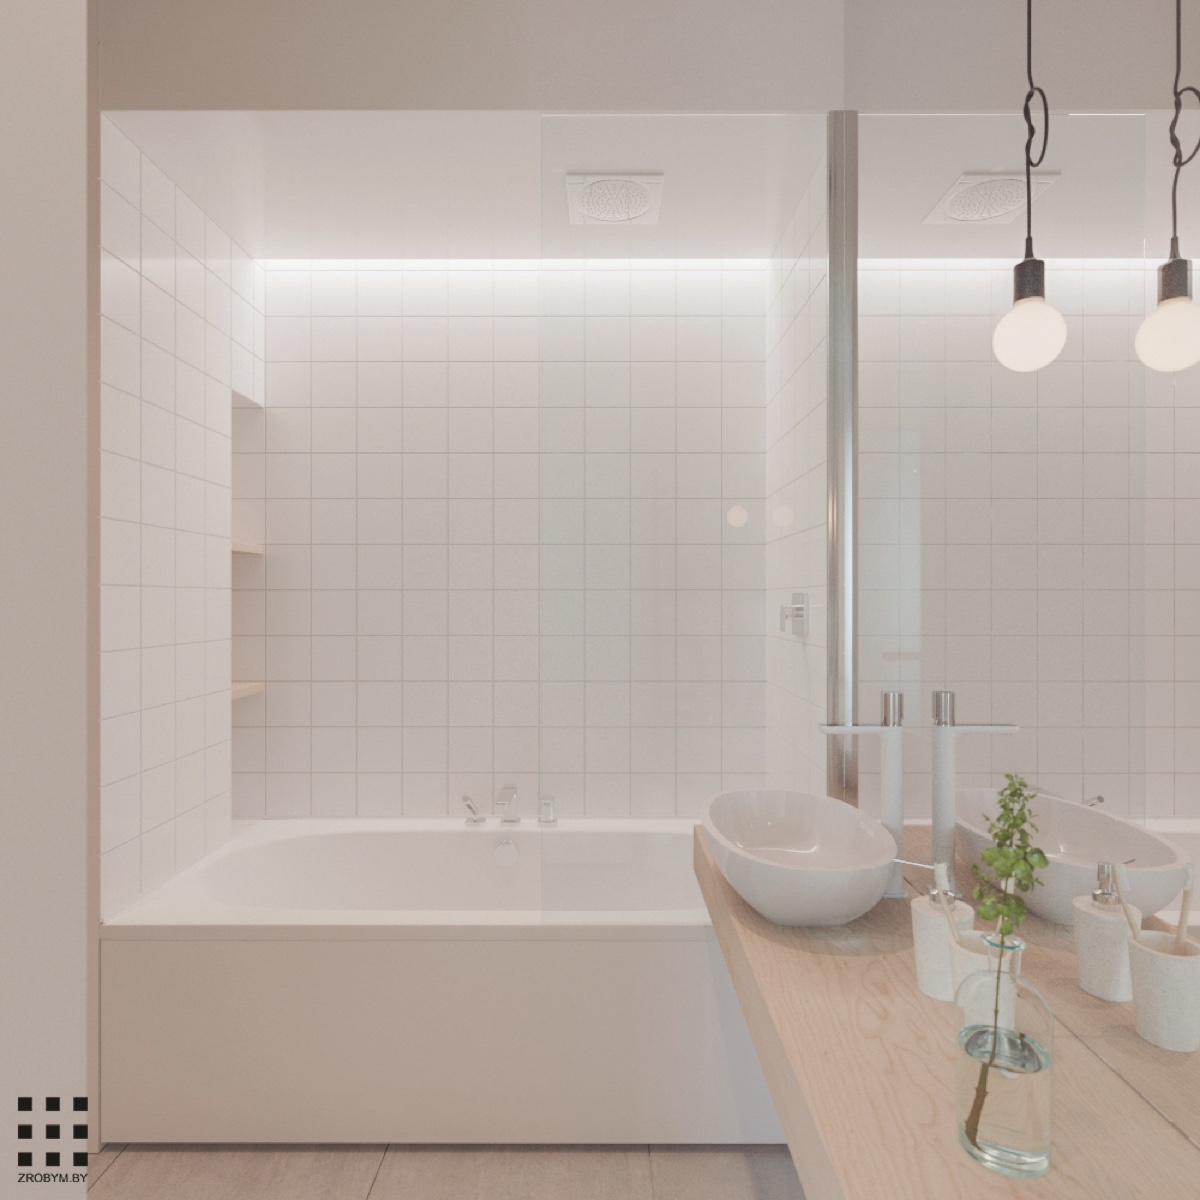 5 Gorgeous Scandinavian Bathroom Ideas: Scandinavian Apartment Design With Beautiful And Cute